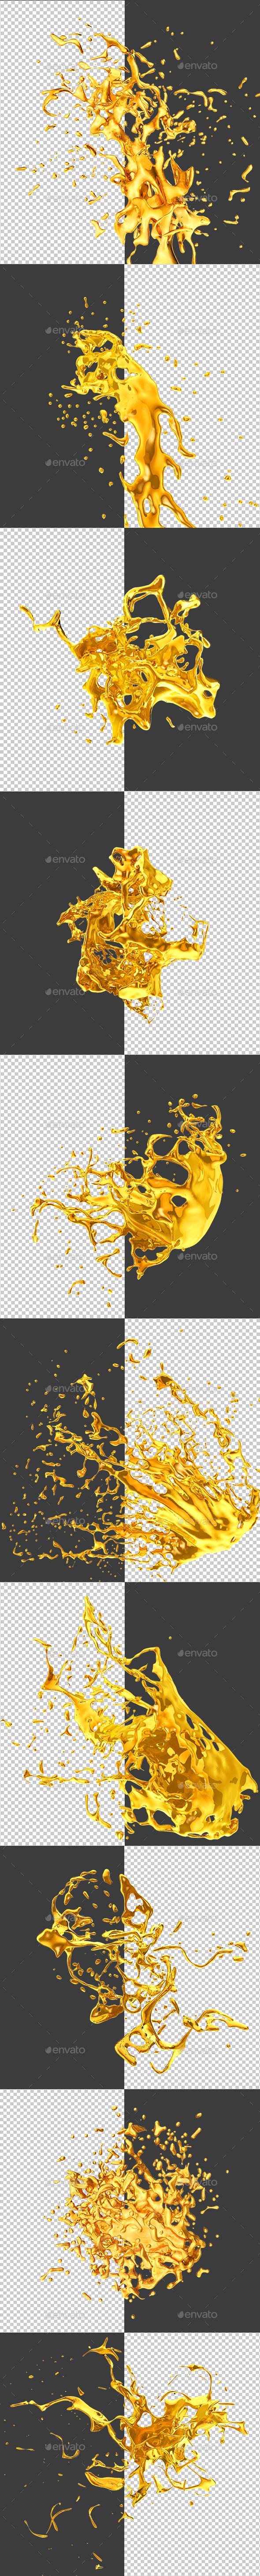 GraphicRiver Golden Spray 20574740